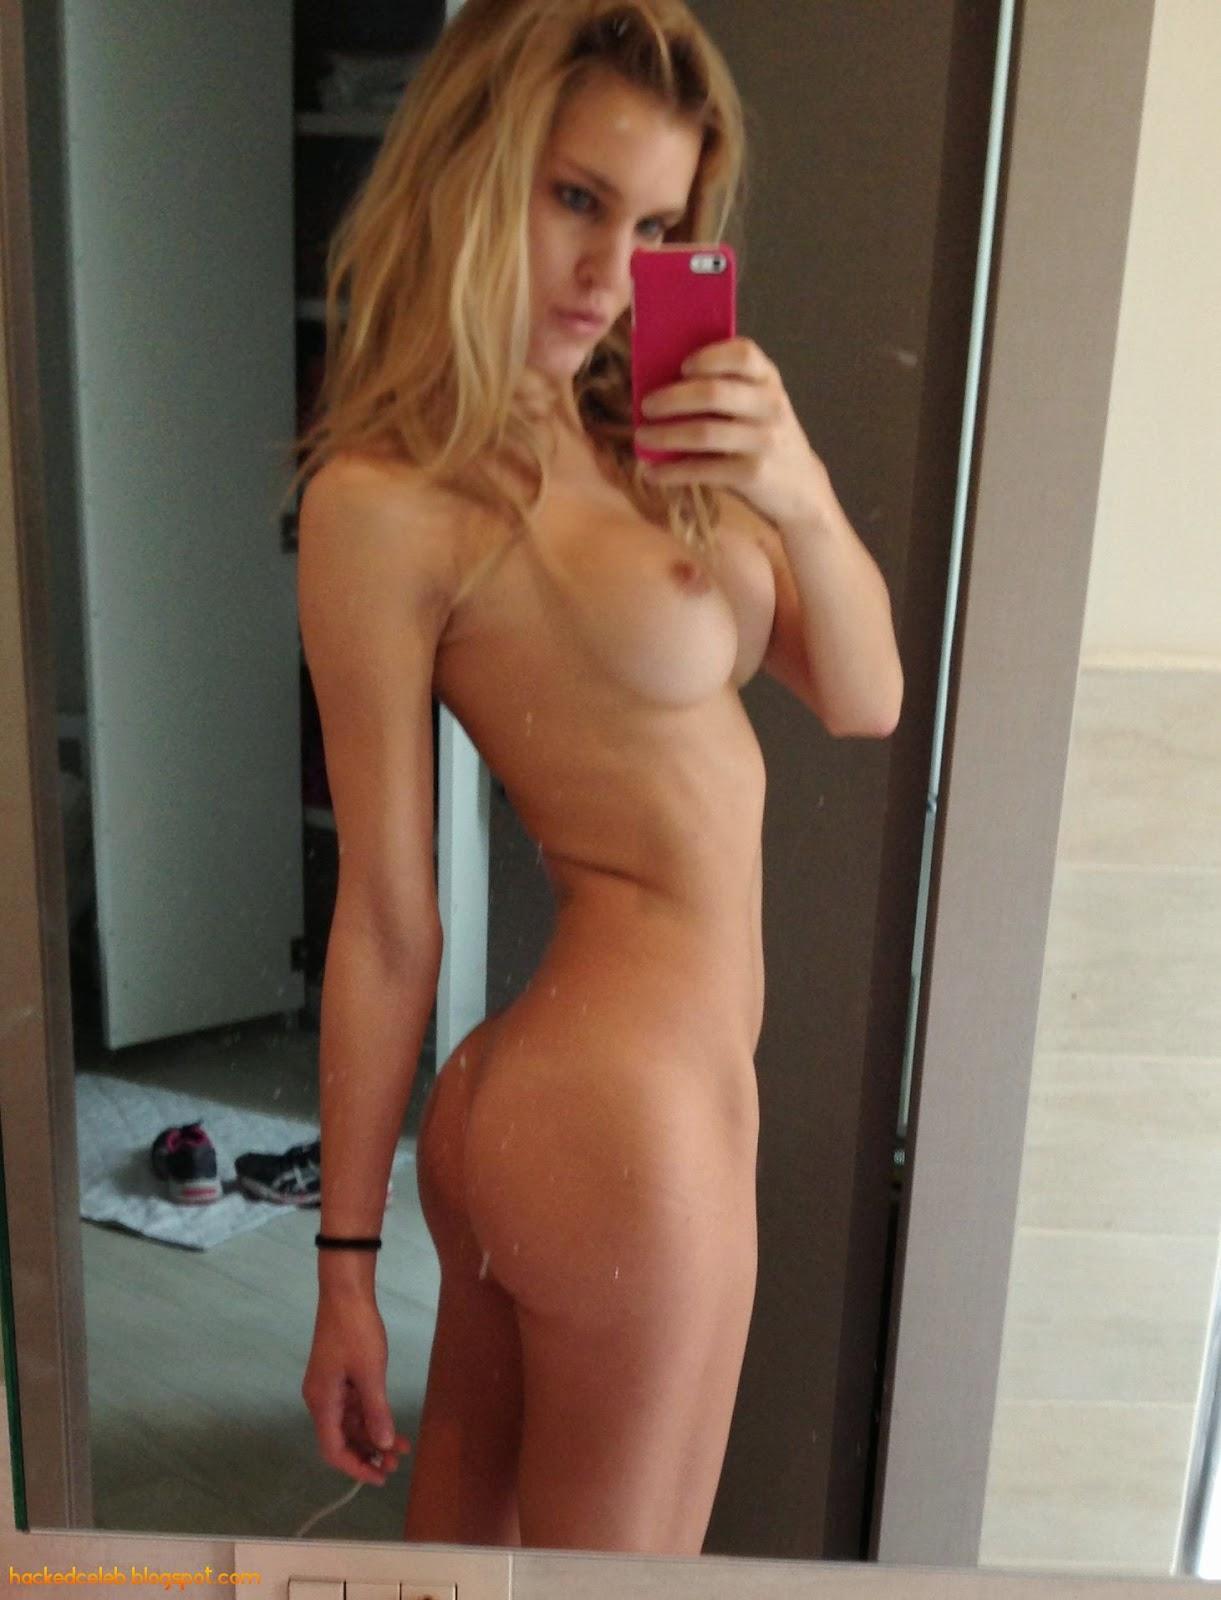 nude selfies male celebrities Famous